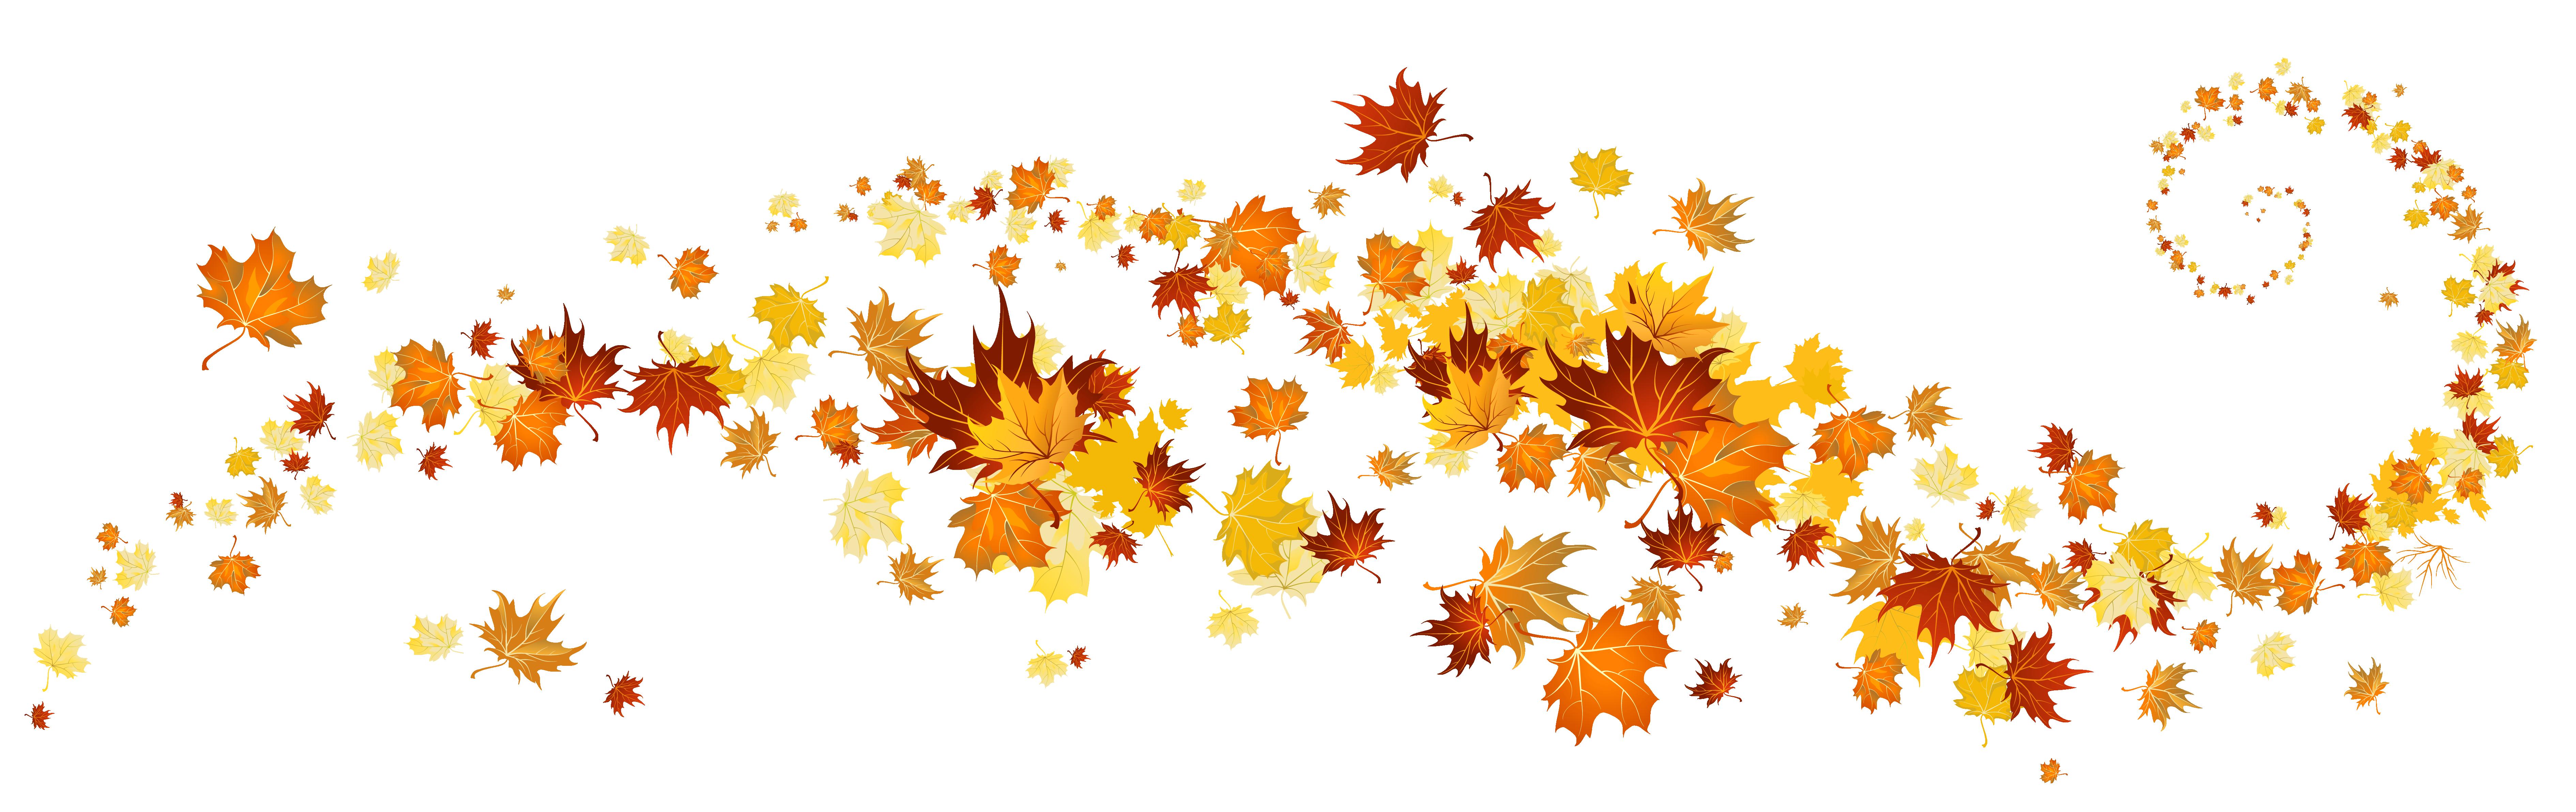 Free Fall Leaves Clip Art - clipartall